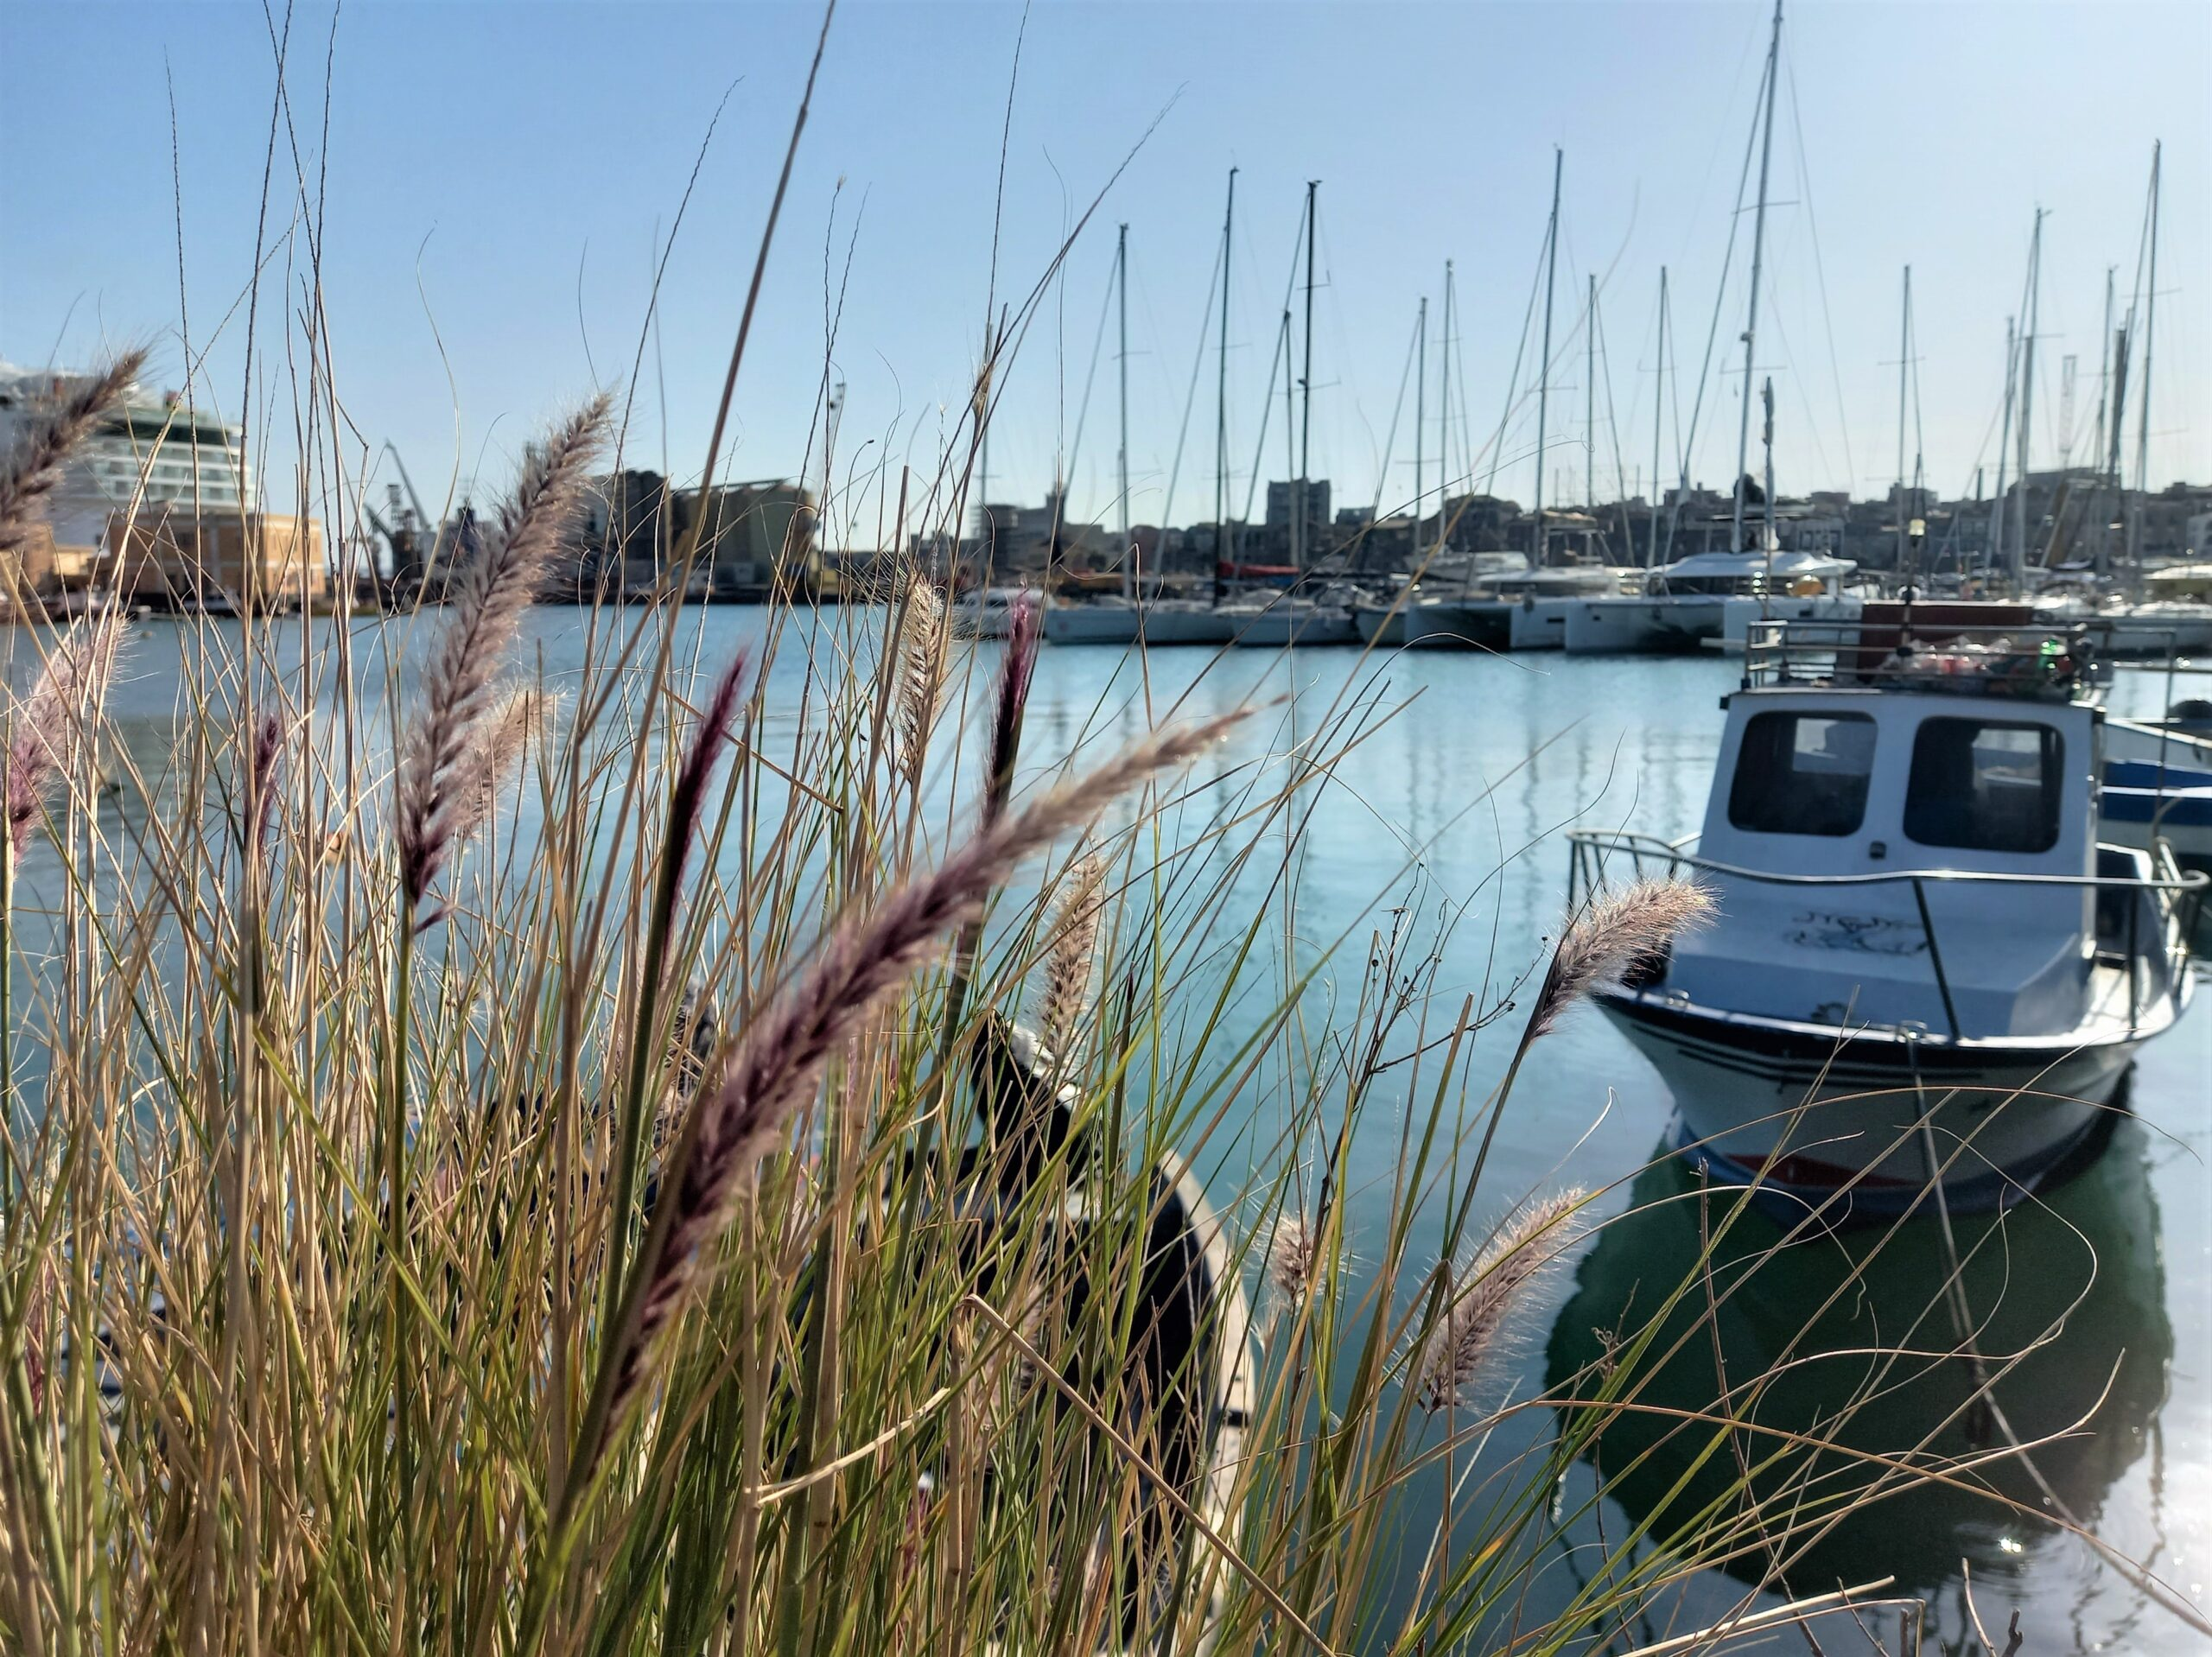 porto catania sicily needs love